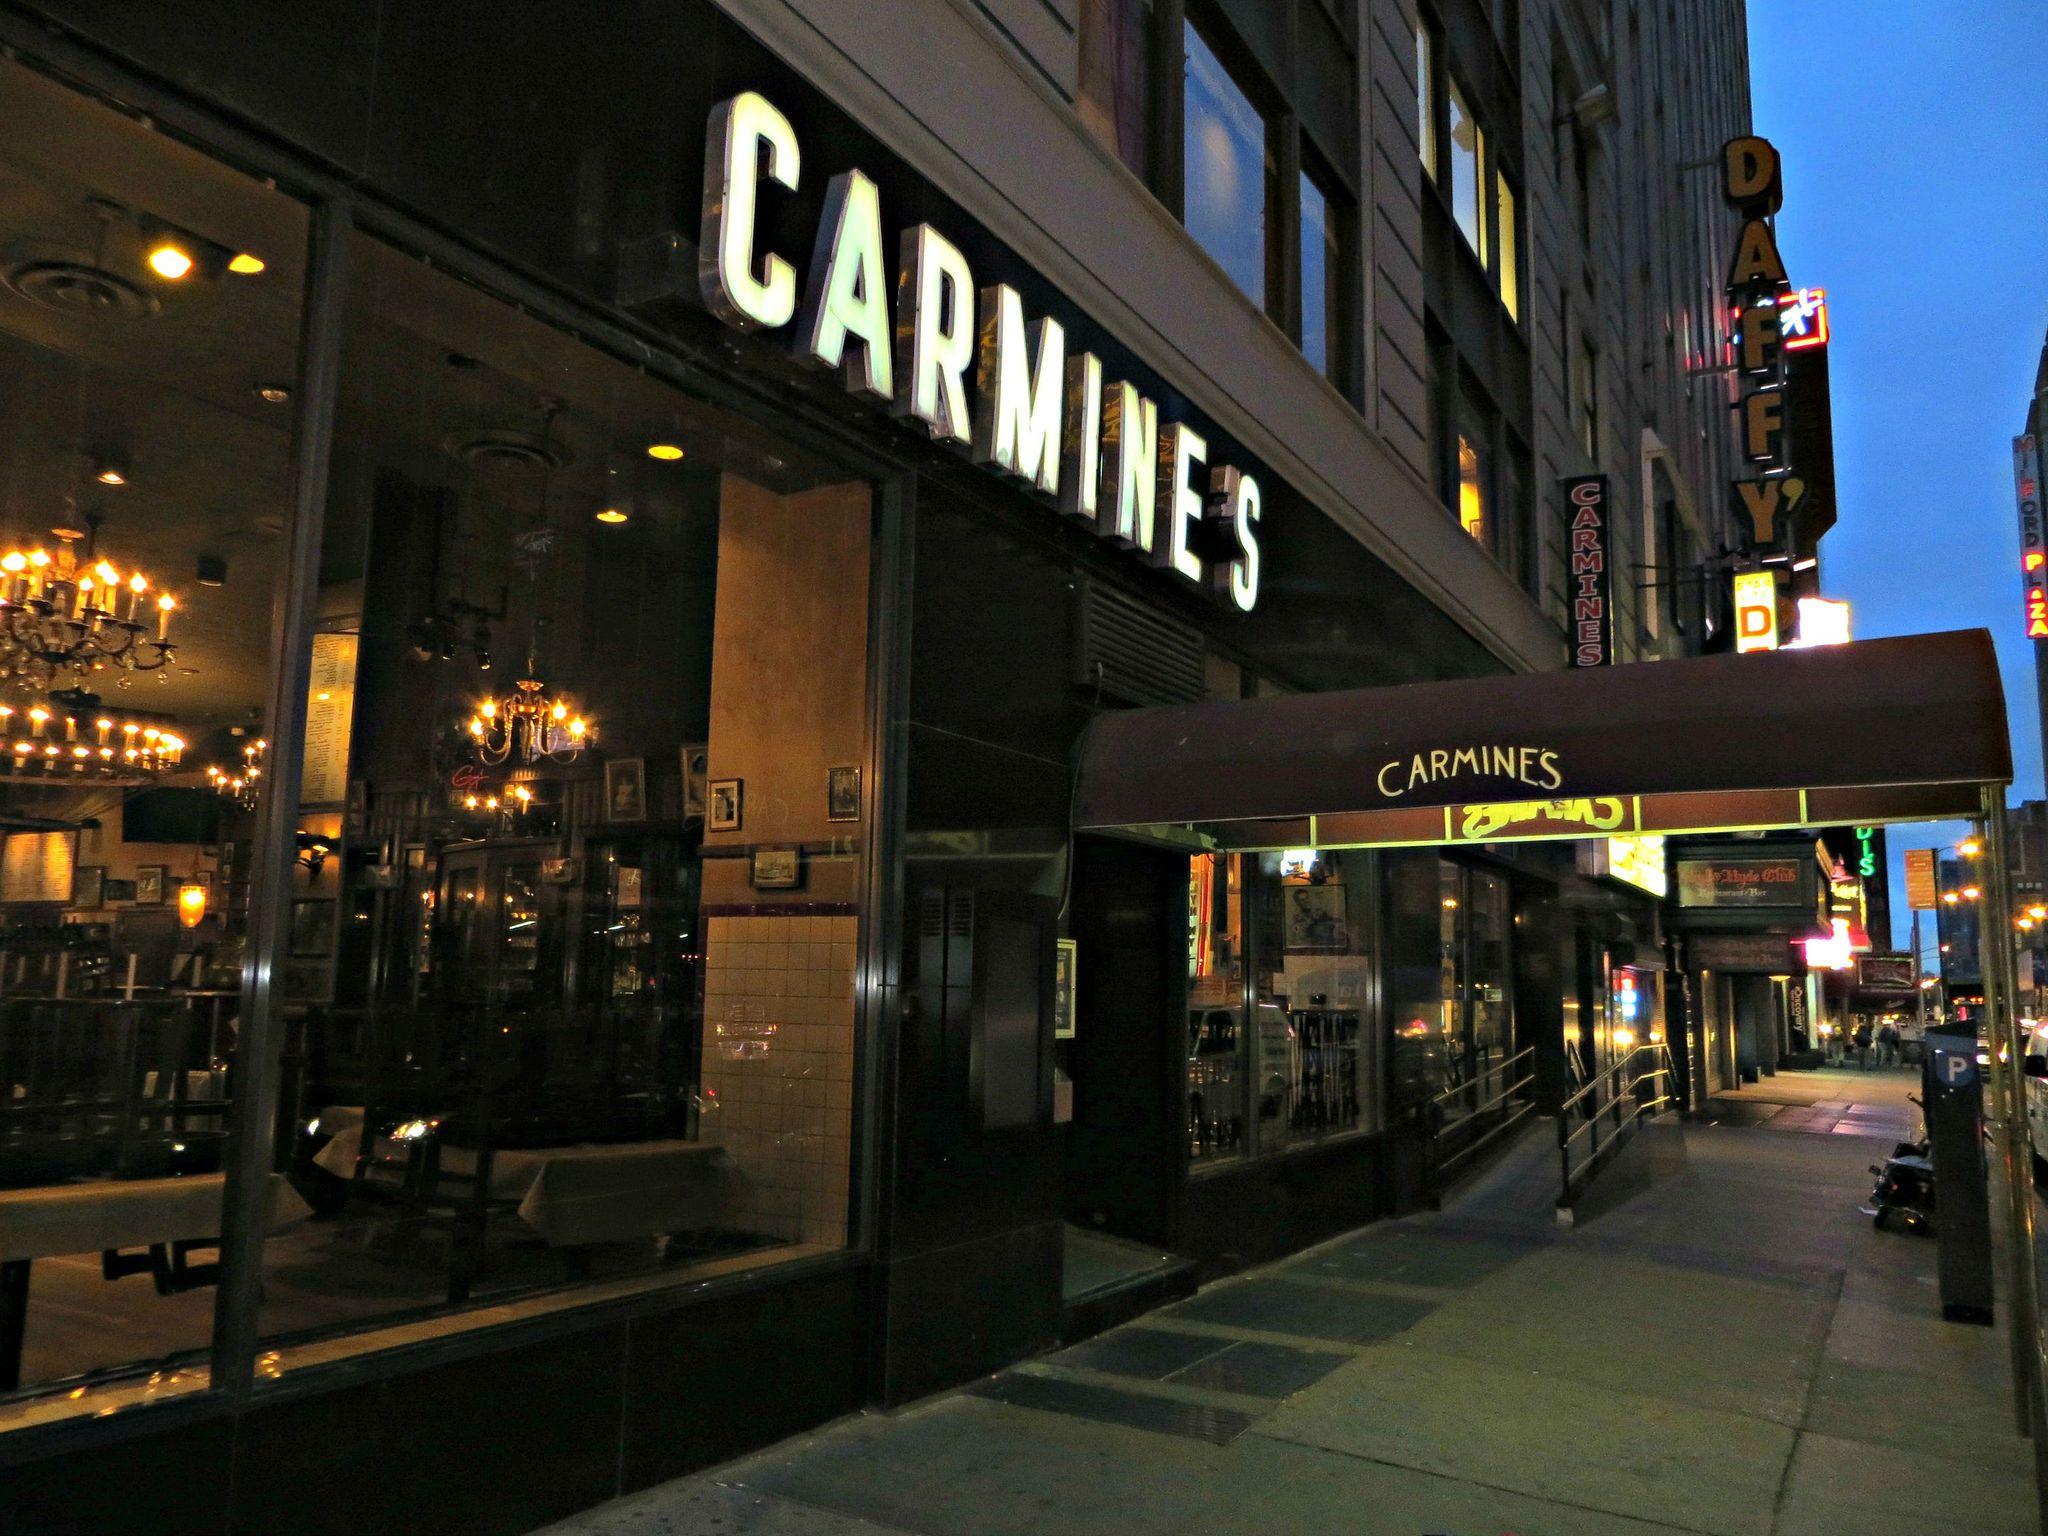 Carmine S Restaurant 200 West 44th Street New York City Carmines Nyc New York City Carmine